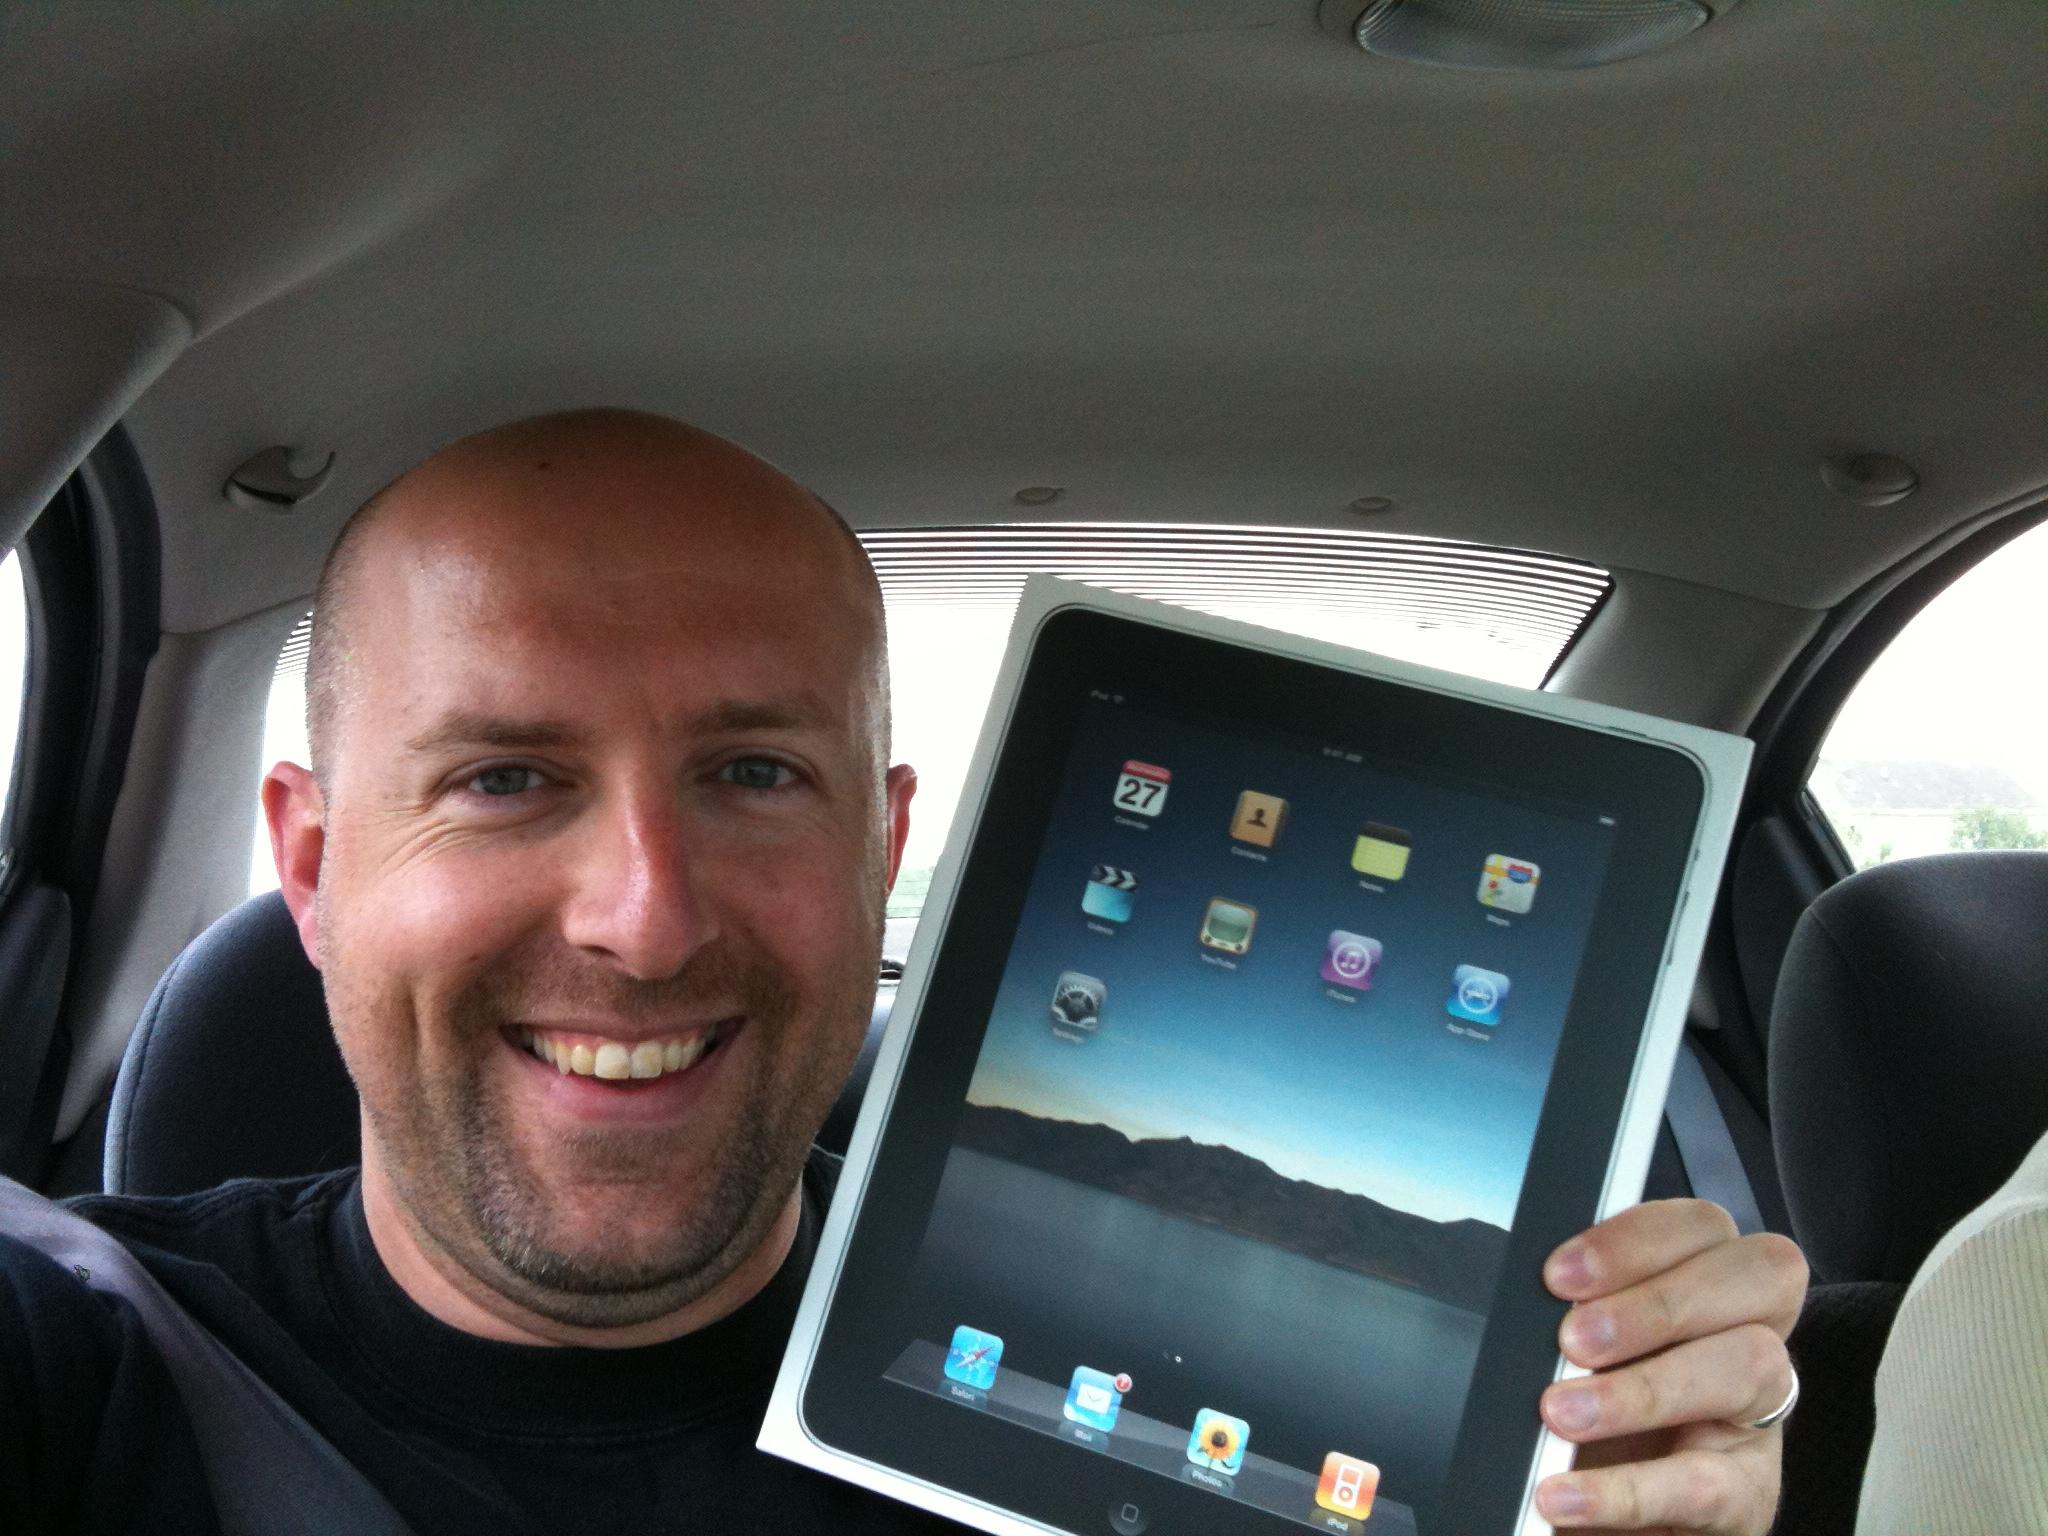 New iPad!